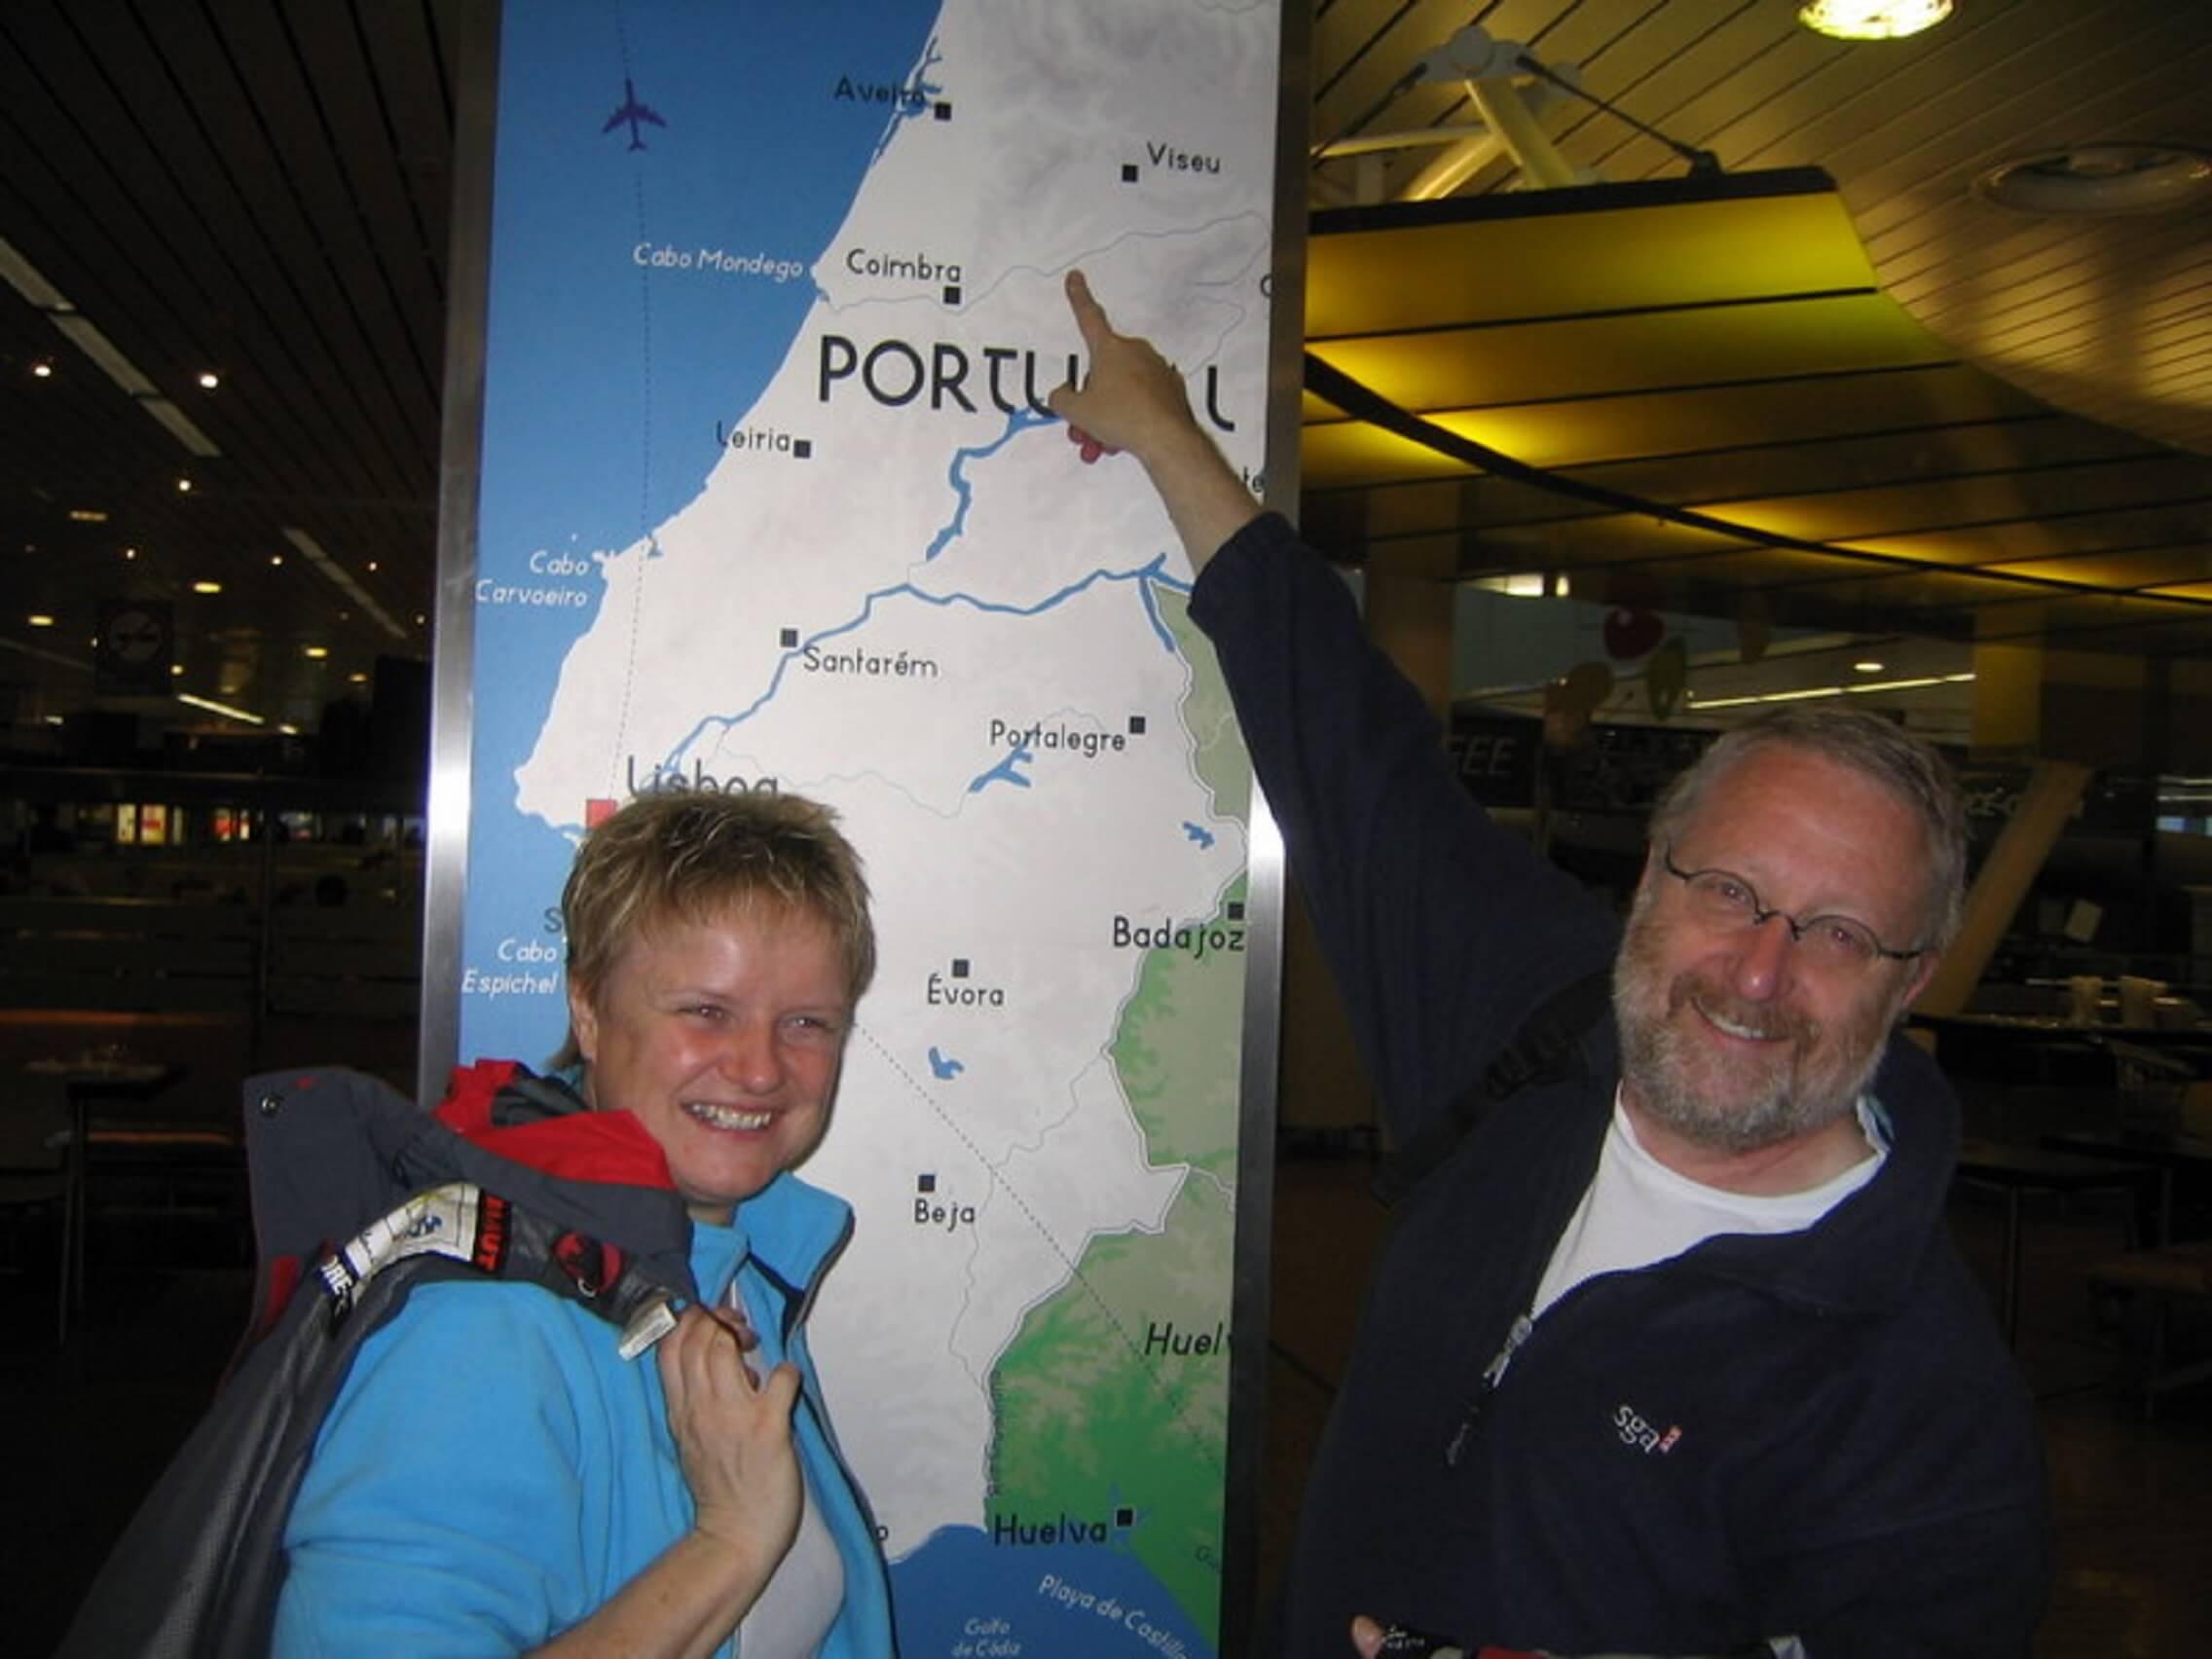 Karin Immerzeel e Jan van Loon com mapa de Portugal